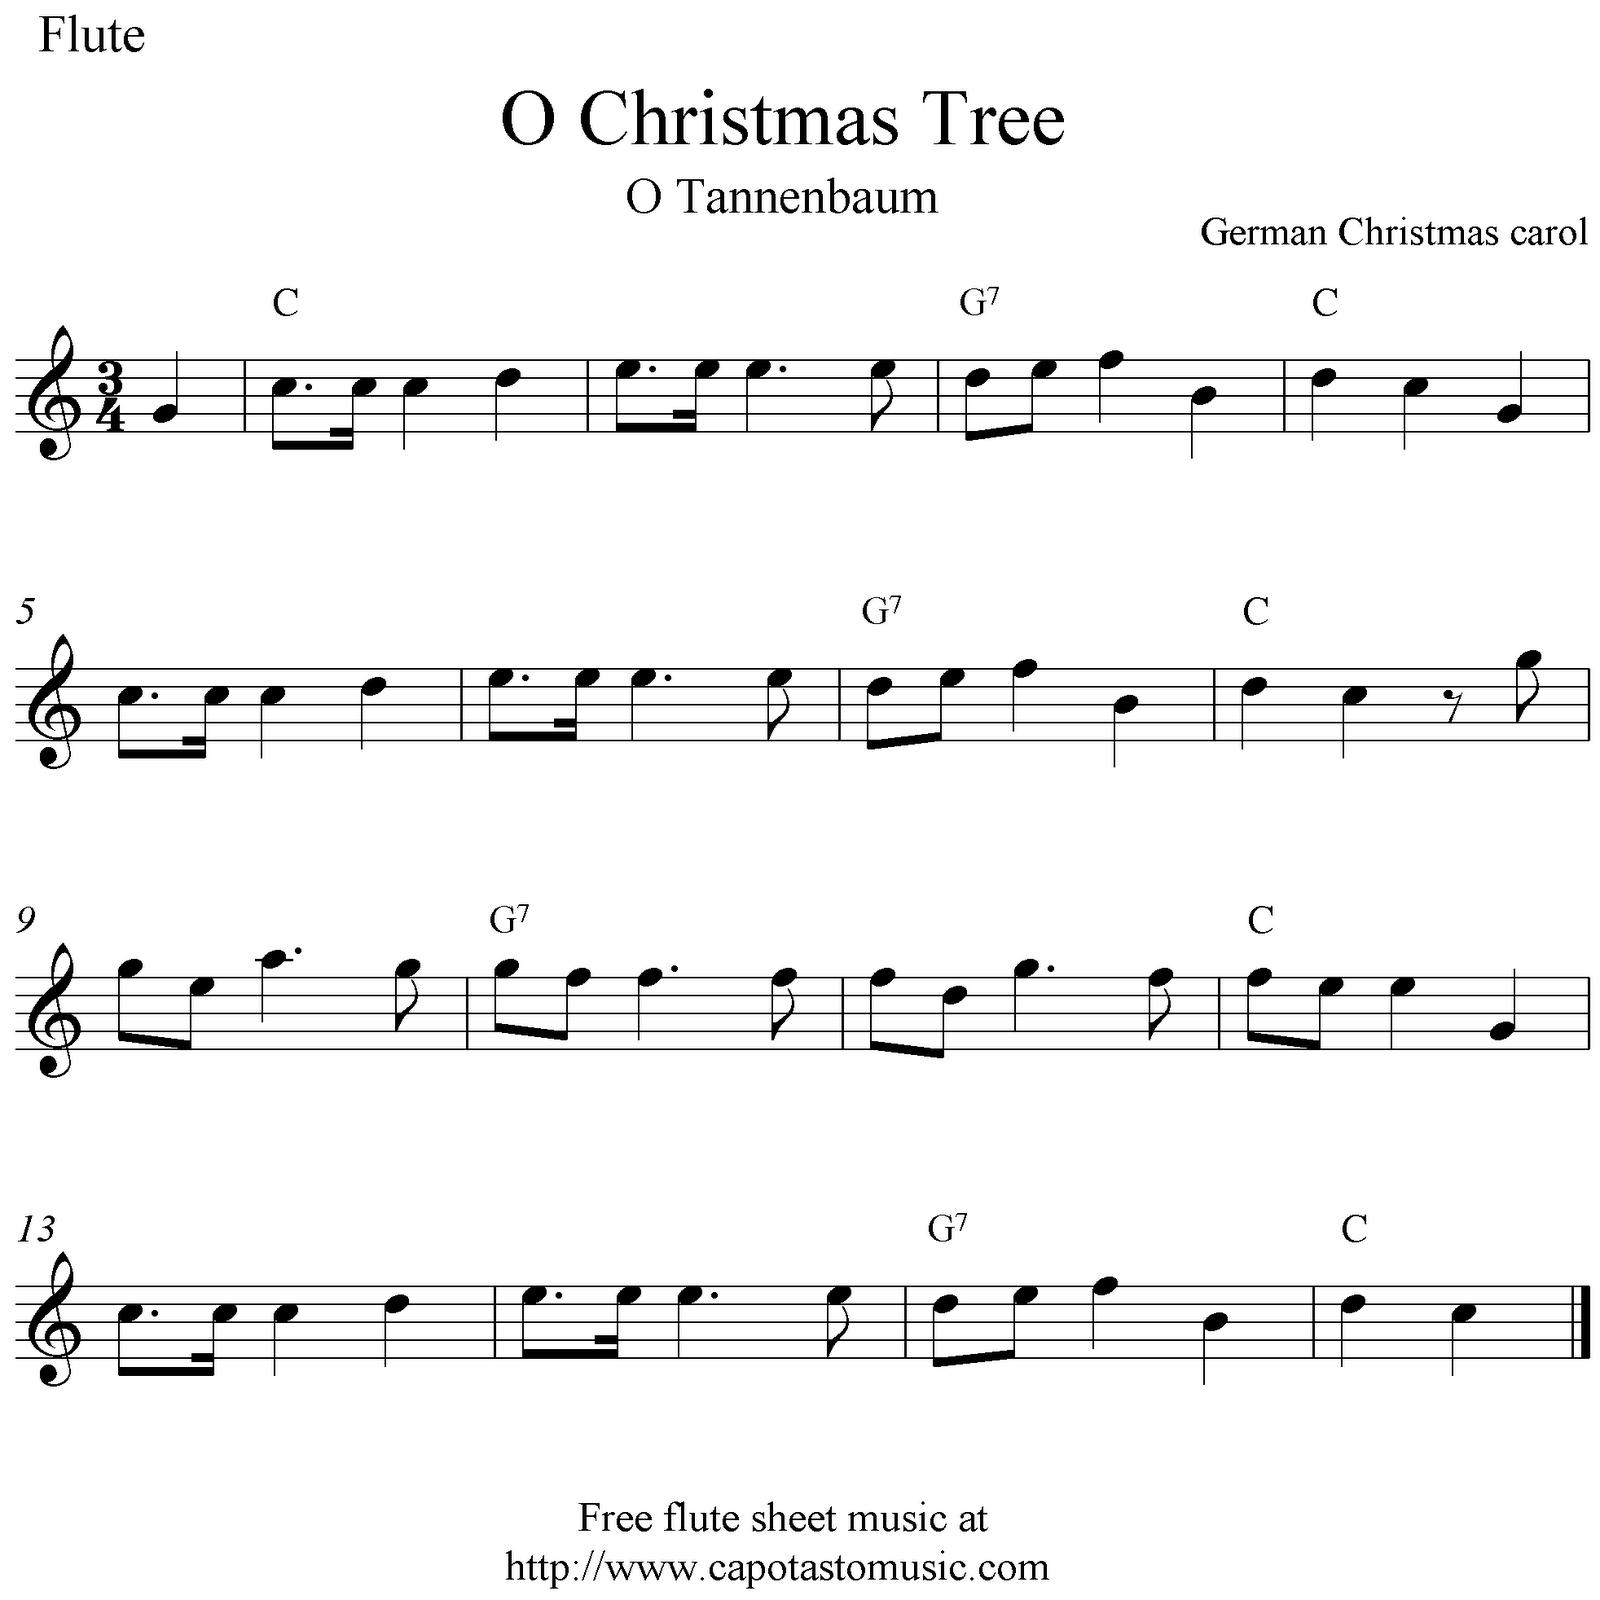 Christmas tree o tannebaum free christmas flute sheet music notes